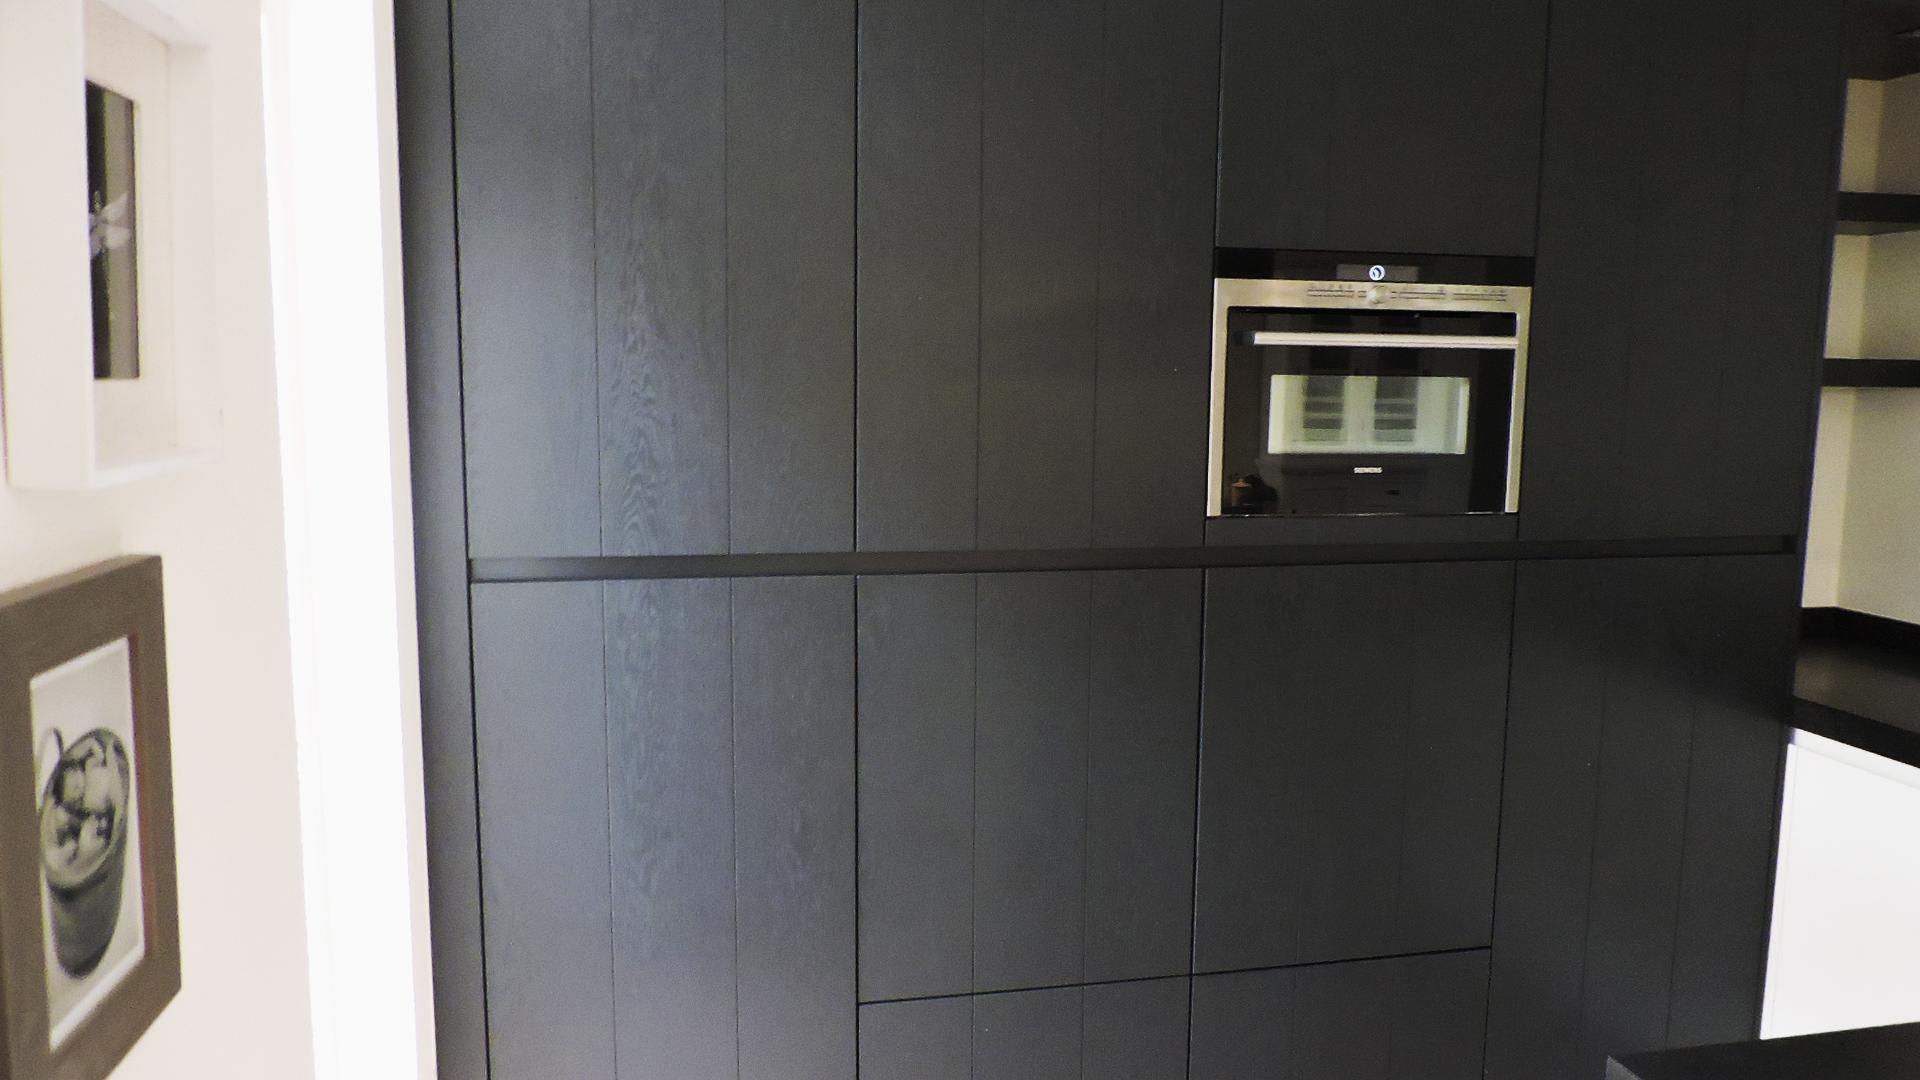 Keuken Eiken Zwart : Keuken eik zwart showroomkeukens be alle showroomkeuken